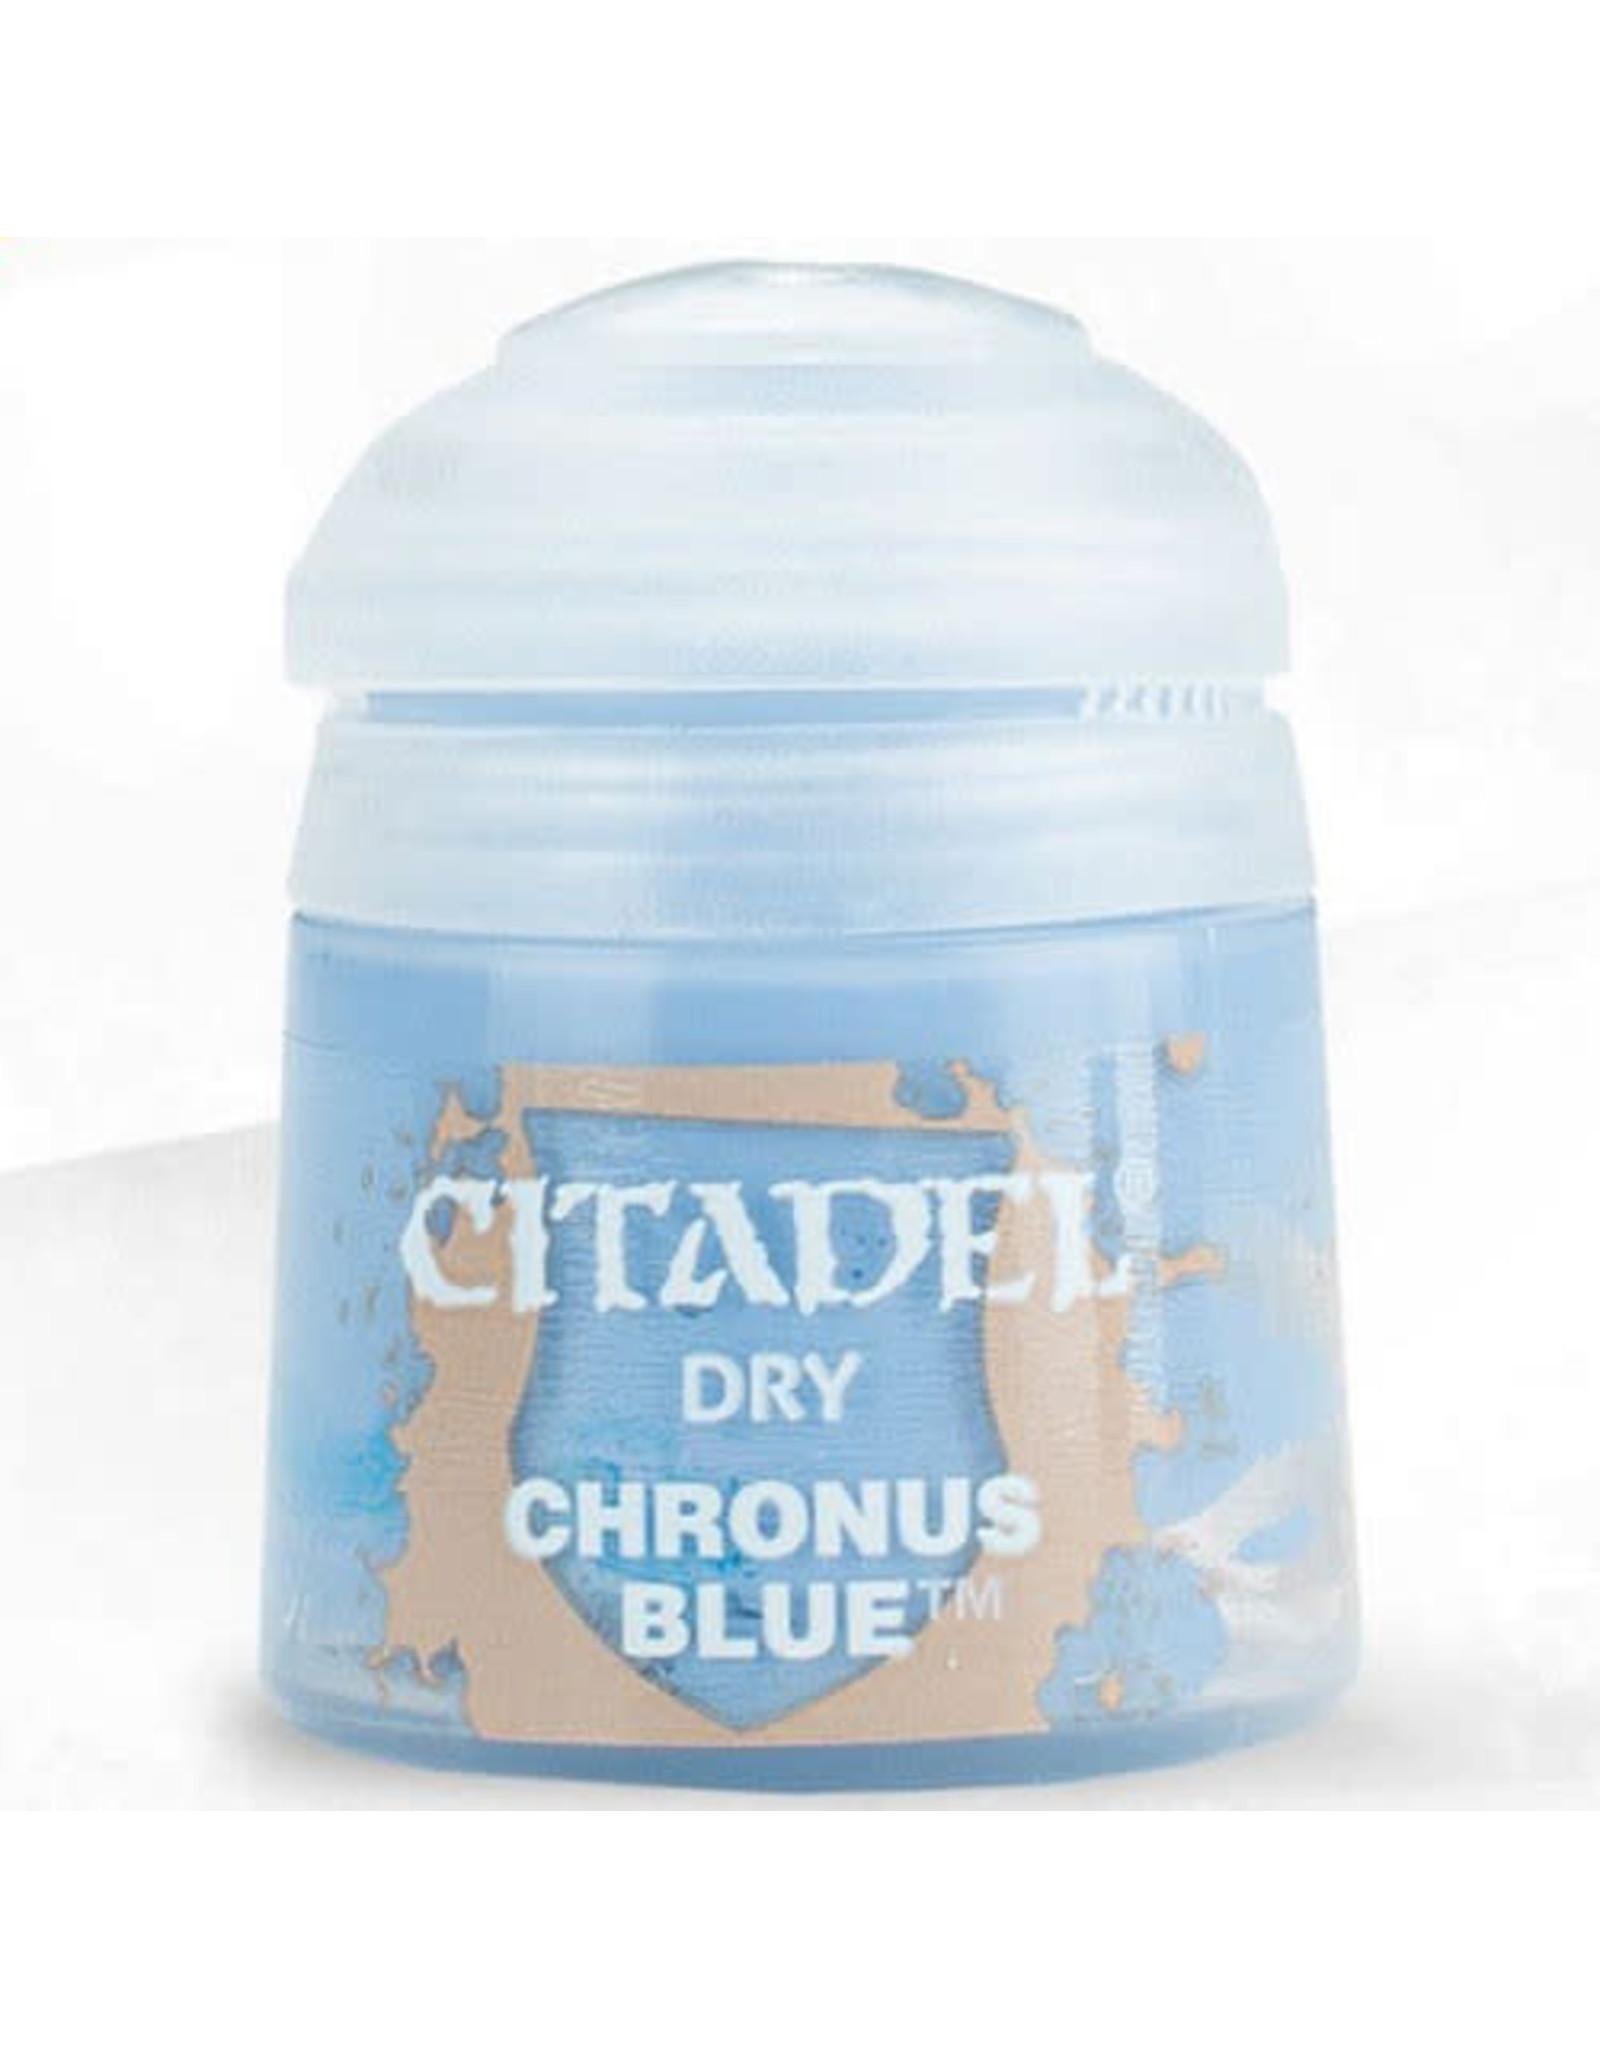 Games Workshop Citadel Paint: Chronus Blue Dry 12ml